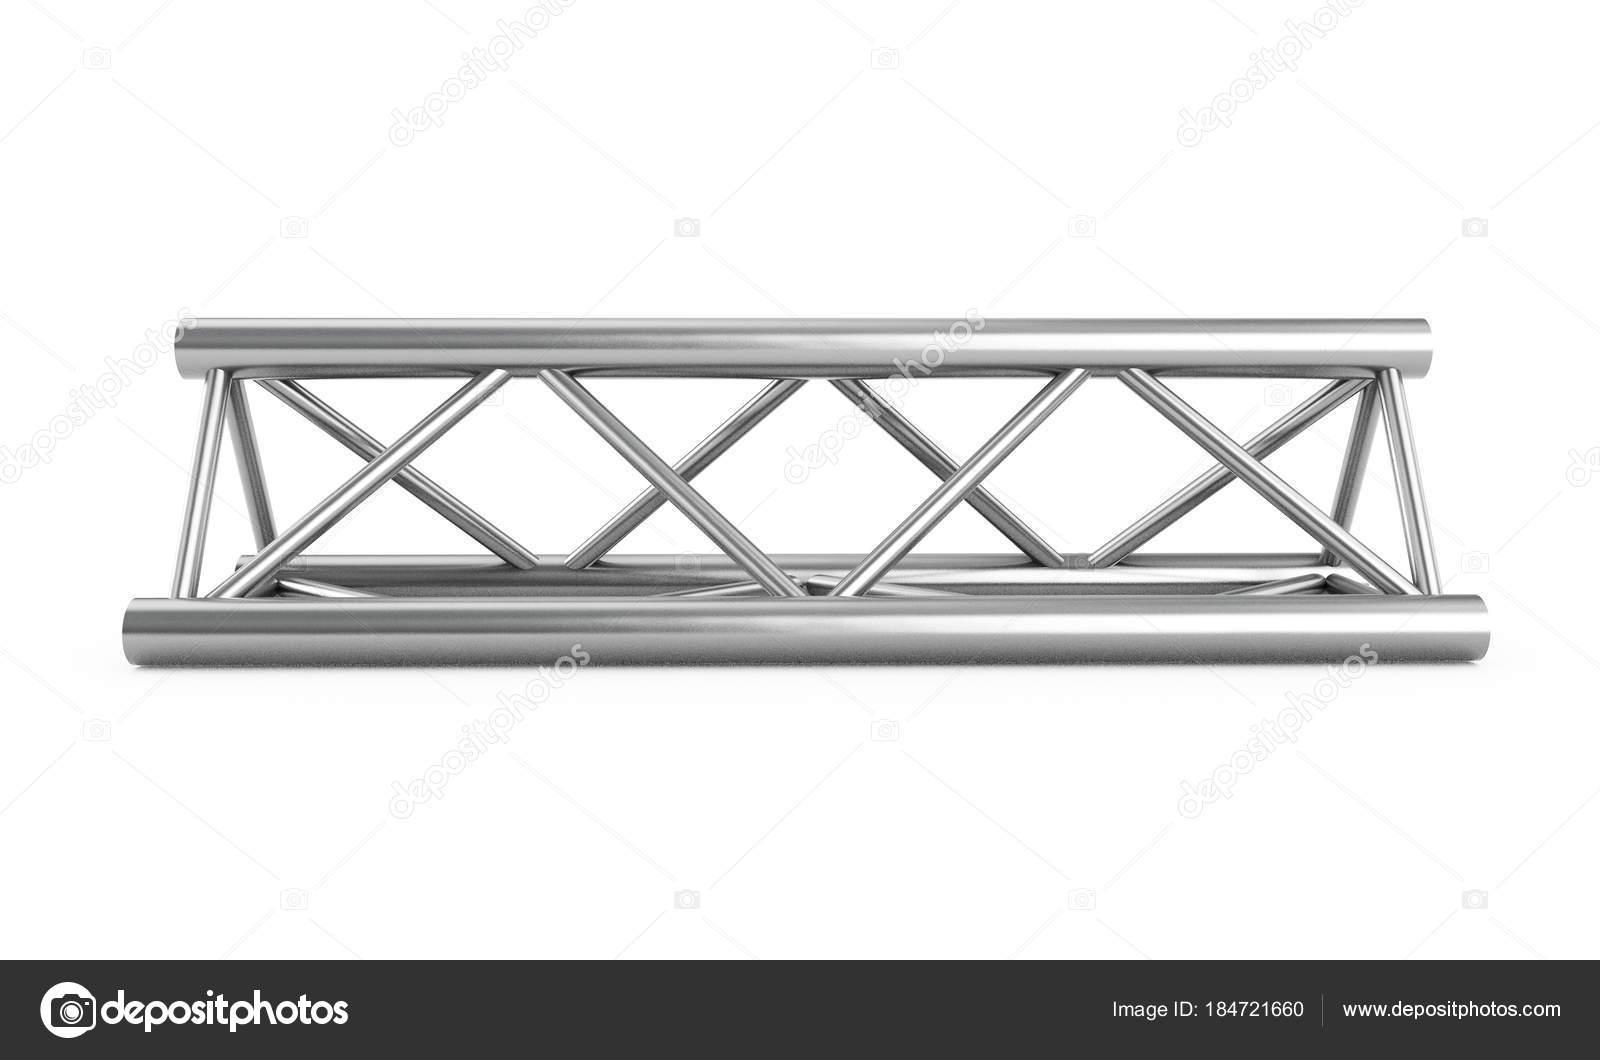 Steel truss girder rooftop construction with outdoor festival st